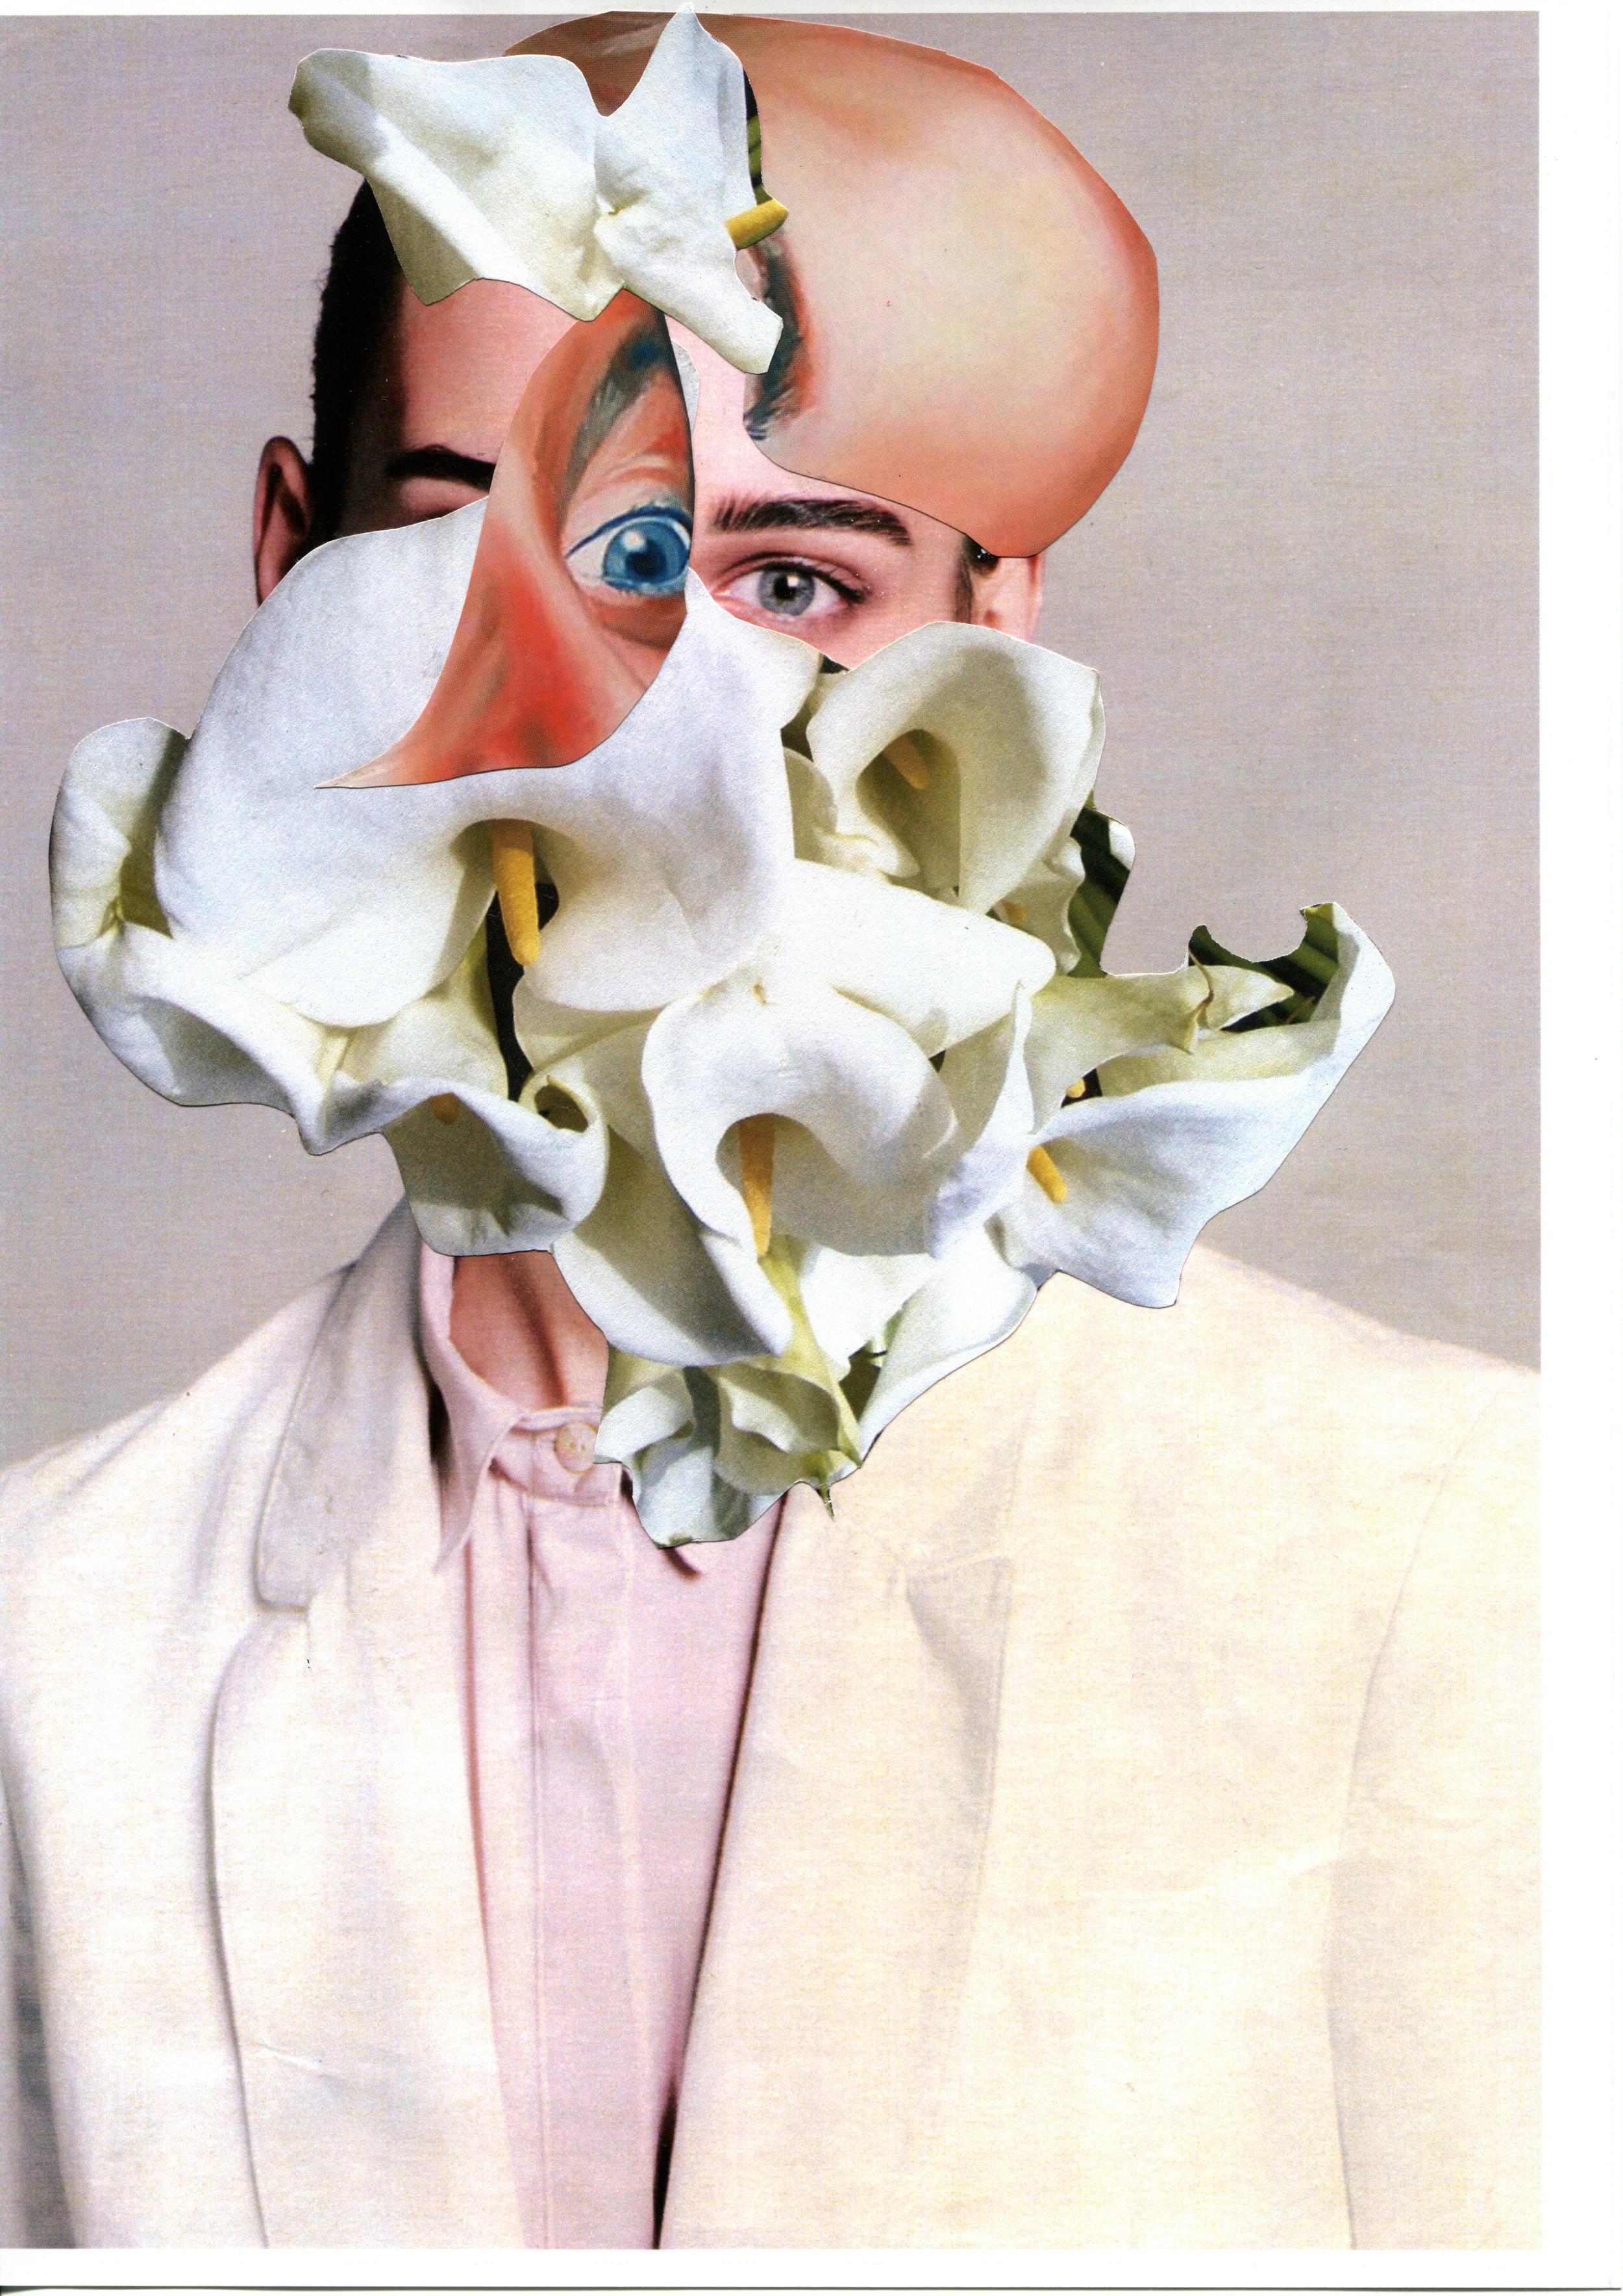 Melt Beauty #2 2015 21 x29,7 cm original collage on paper